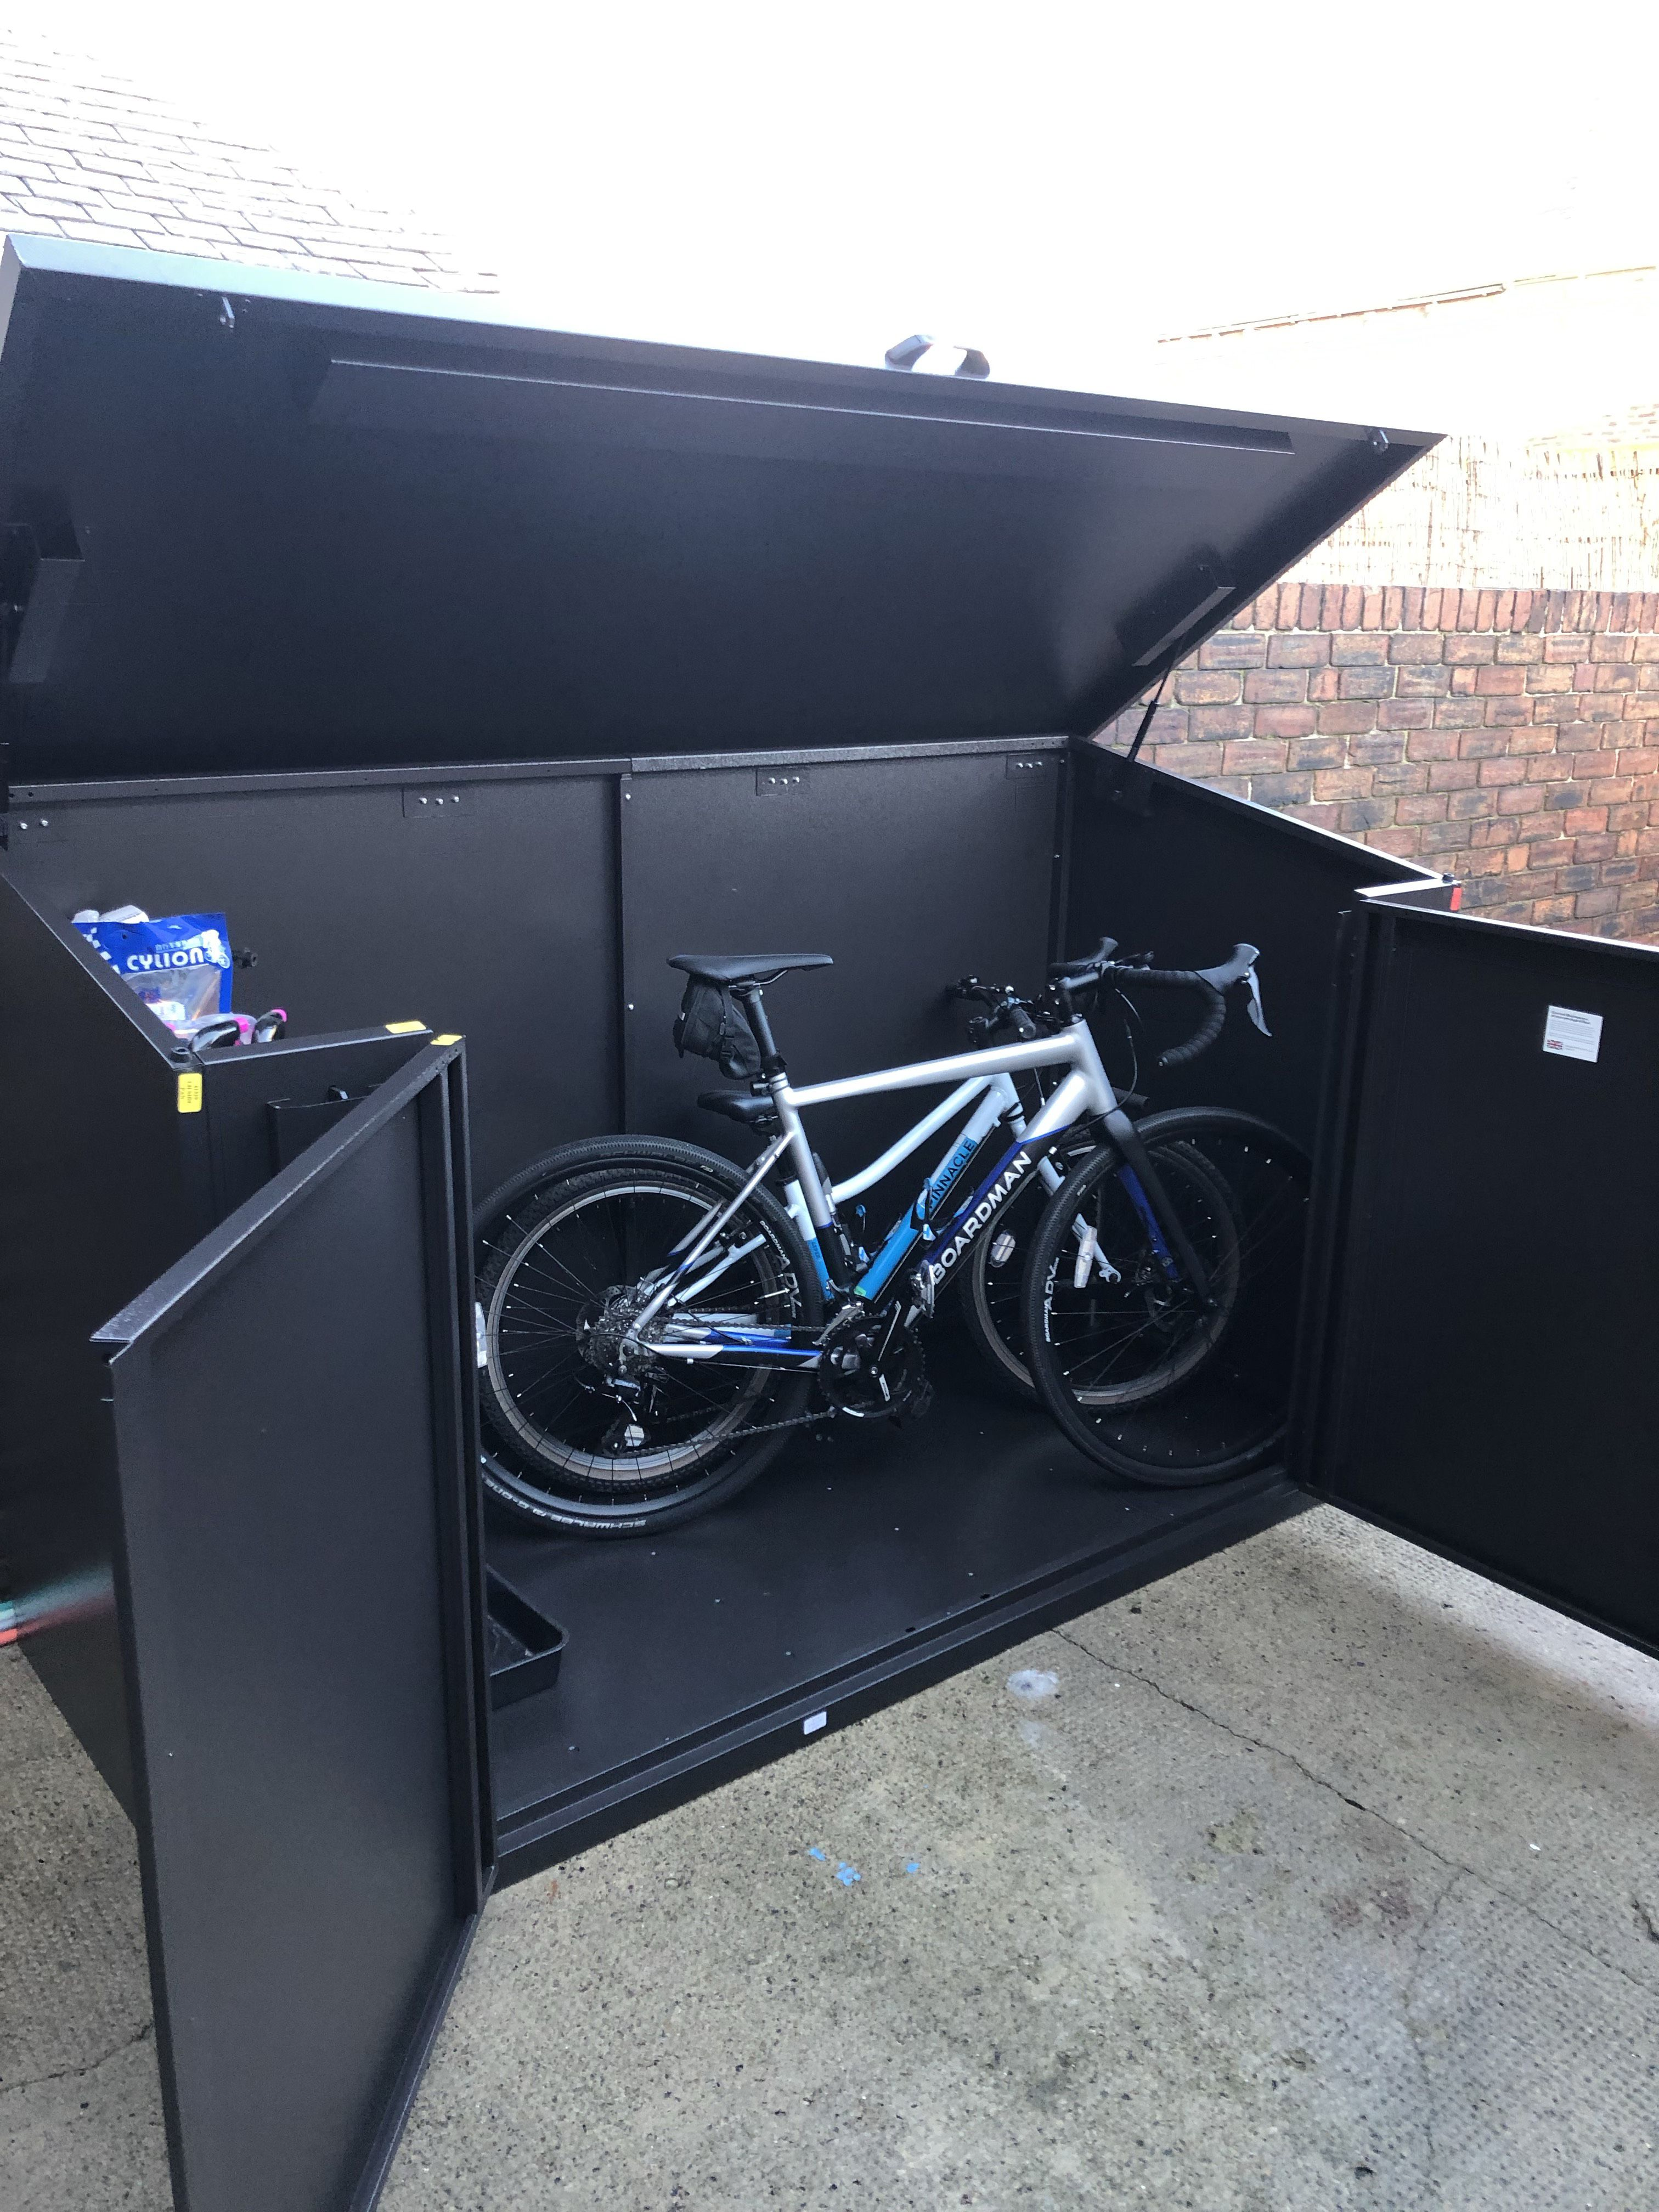 Outdoor Bike Storage Outdoor Bike Storage Secure Bike Storage Bike Shed